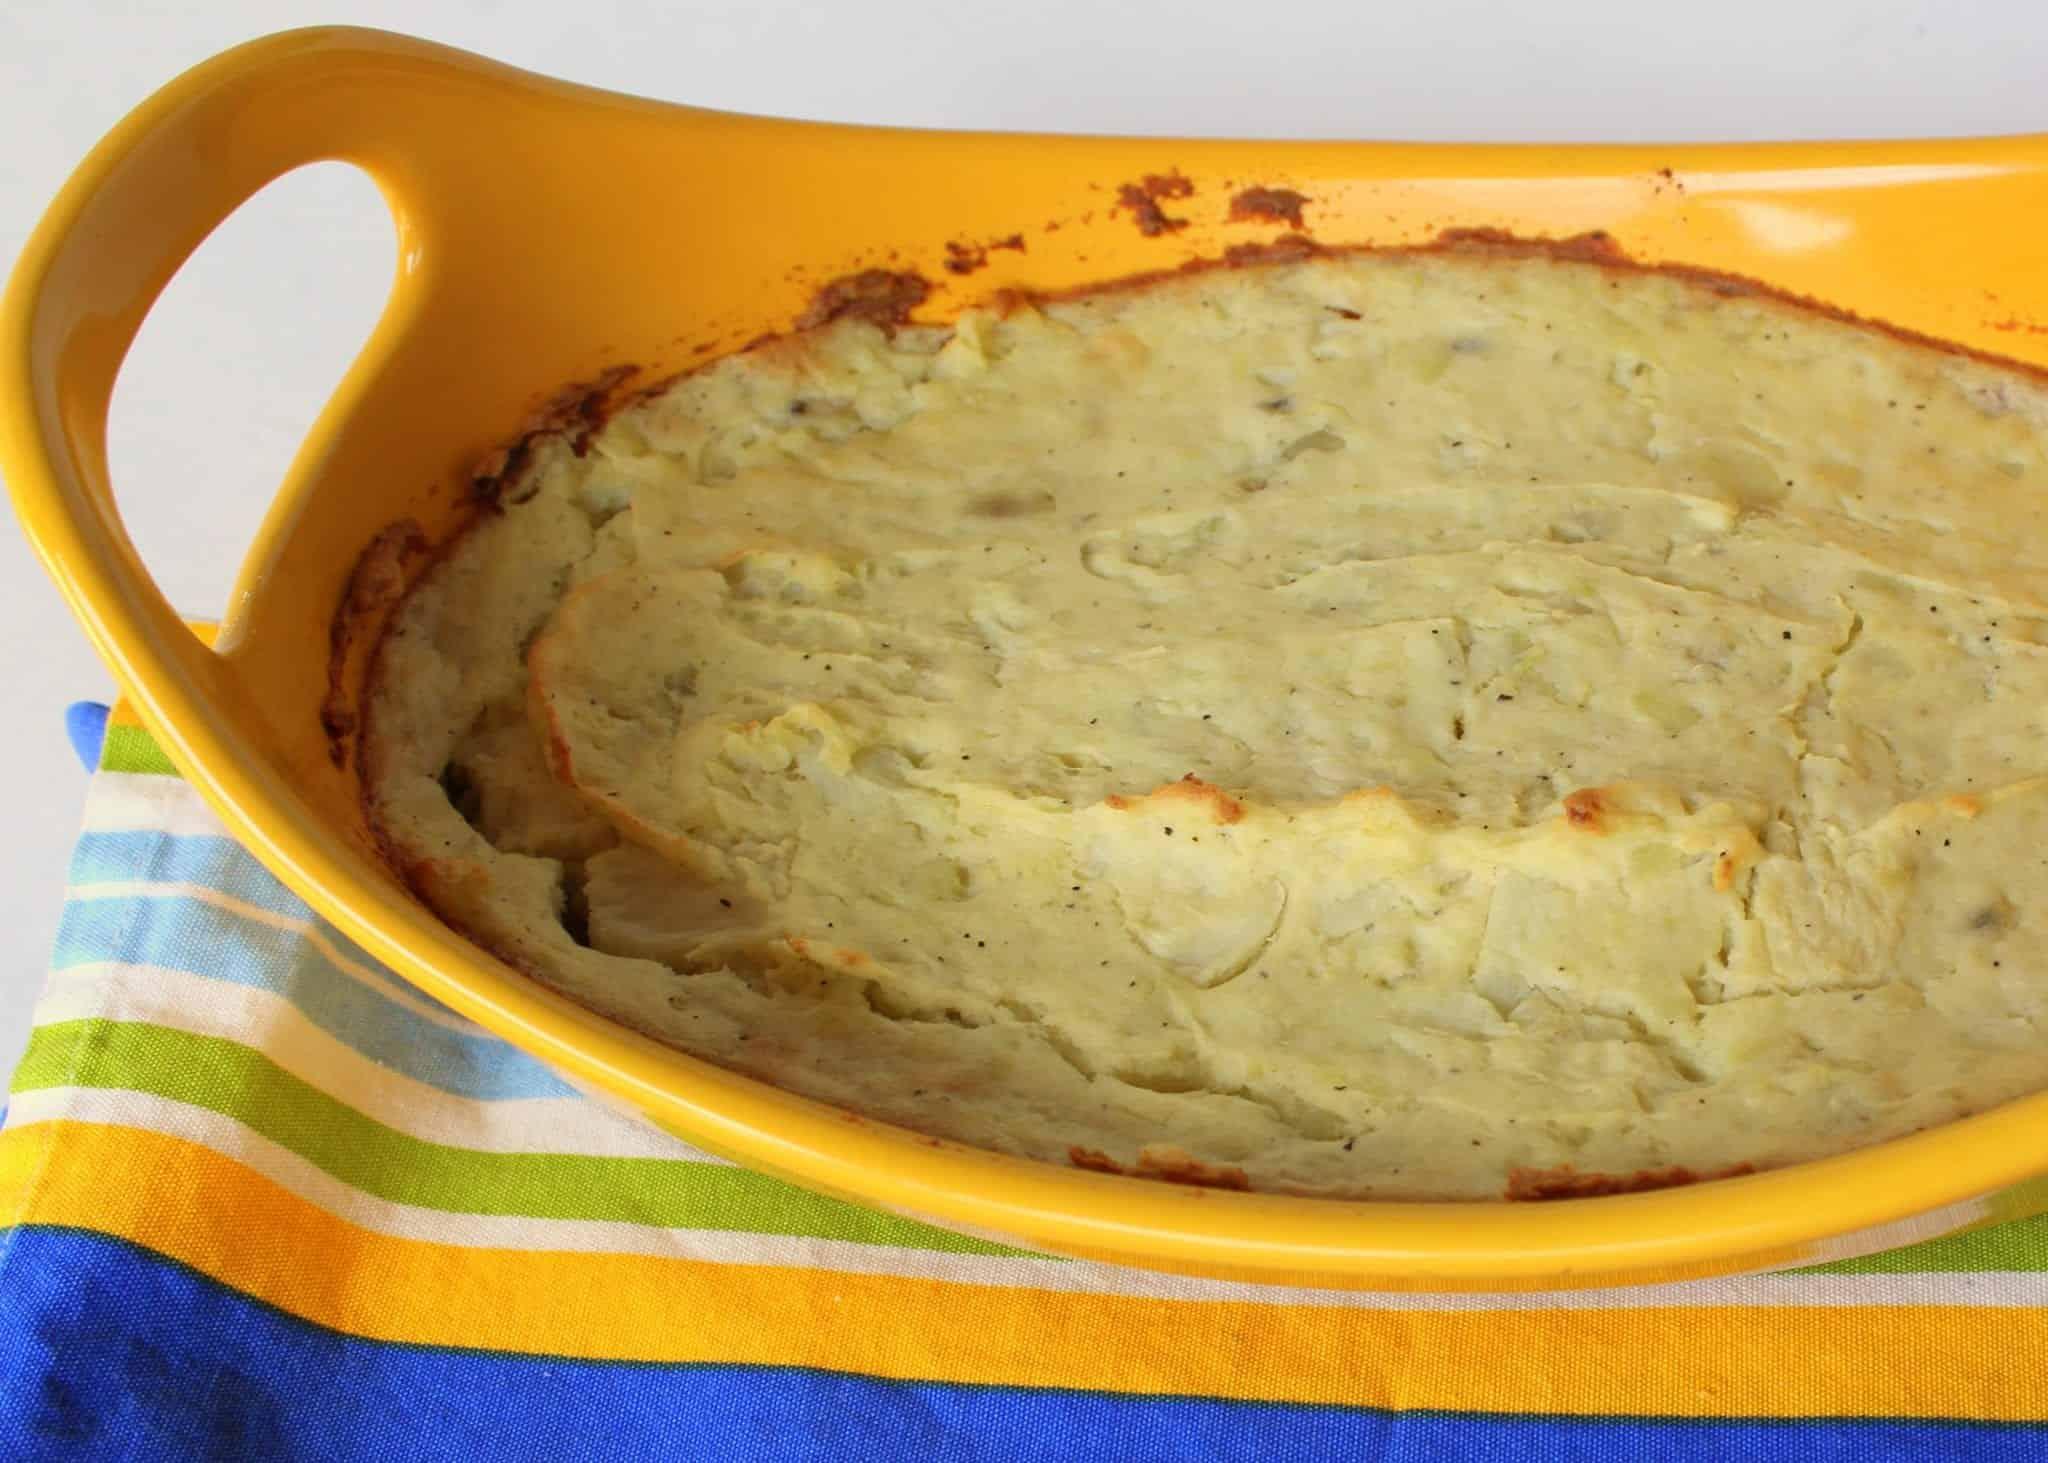 Chicken Lentil Shepherd's Pie from Treble in the Kitchen